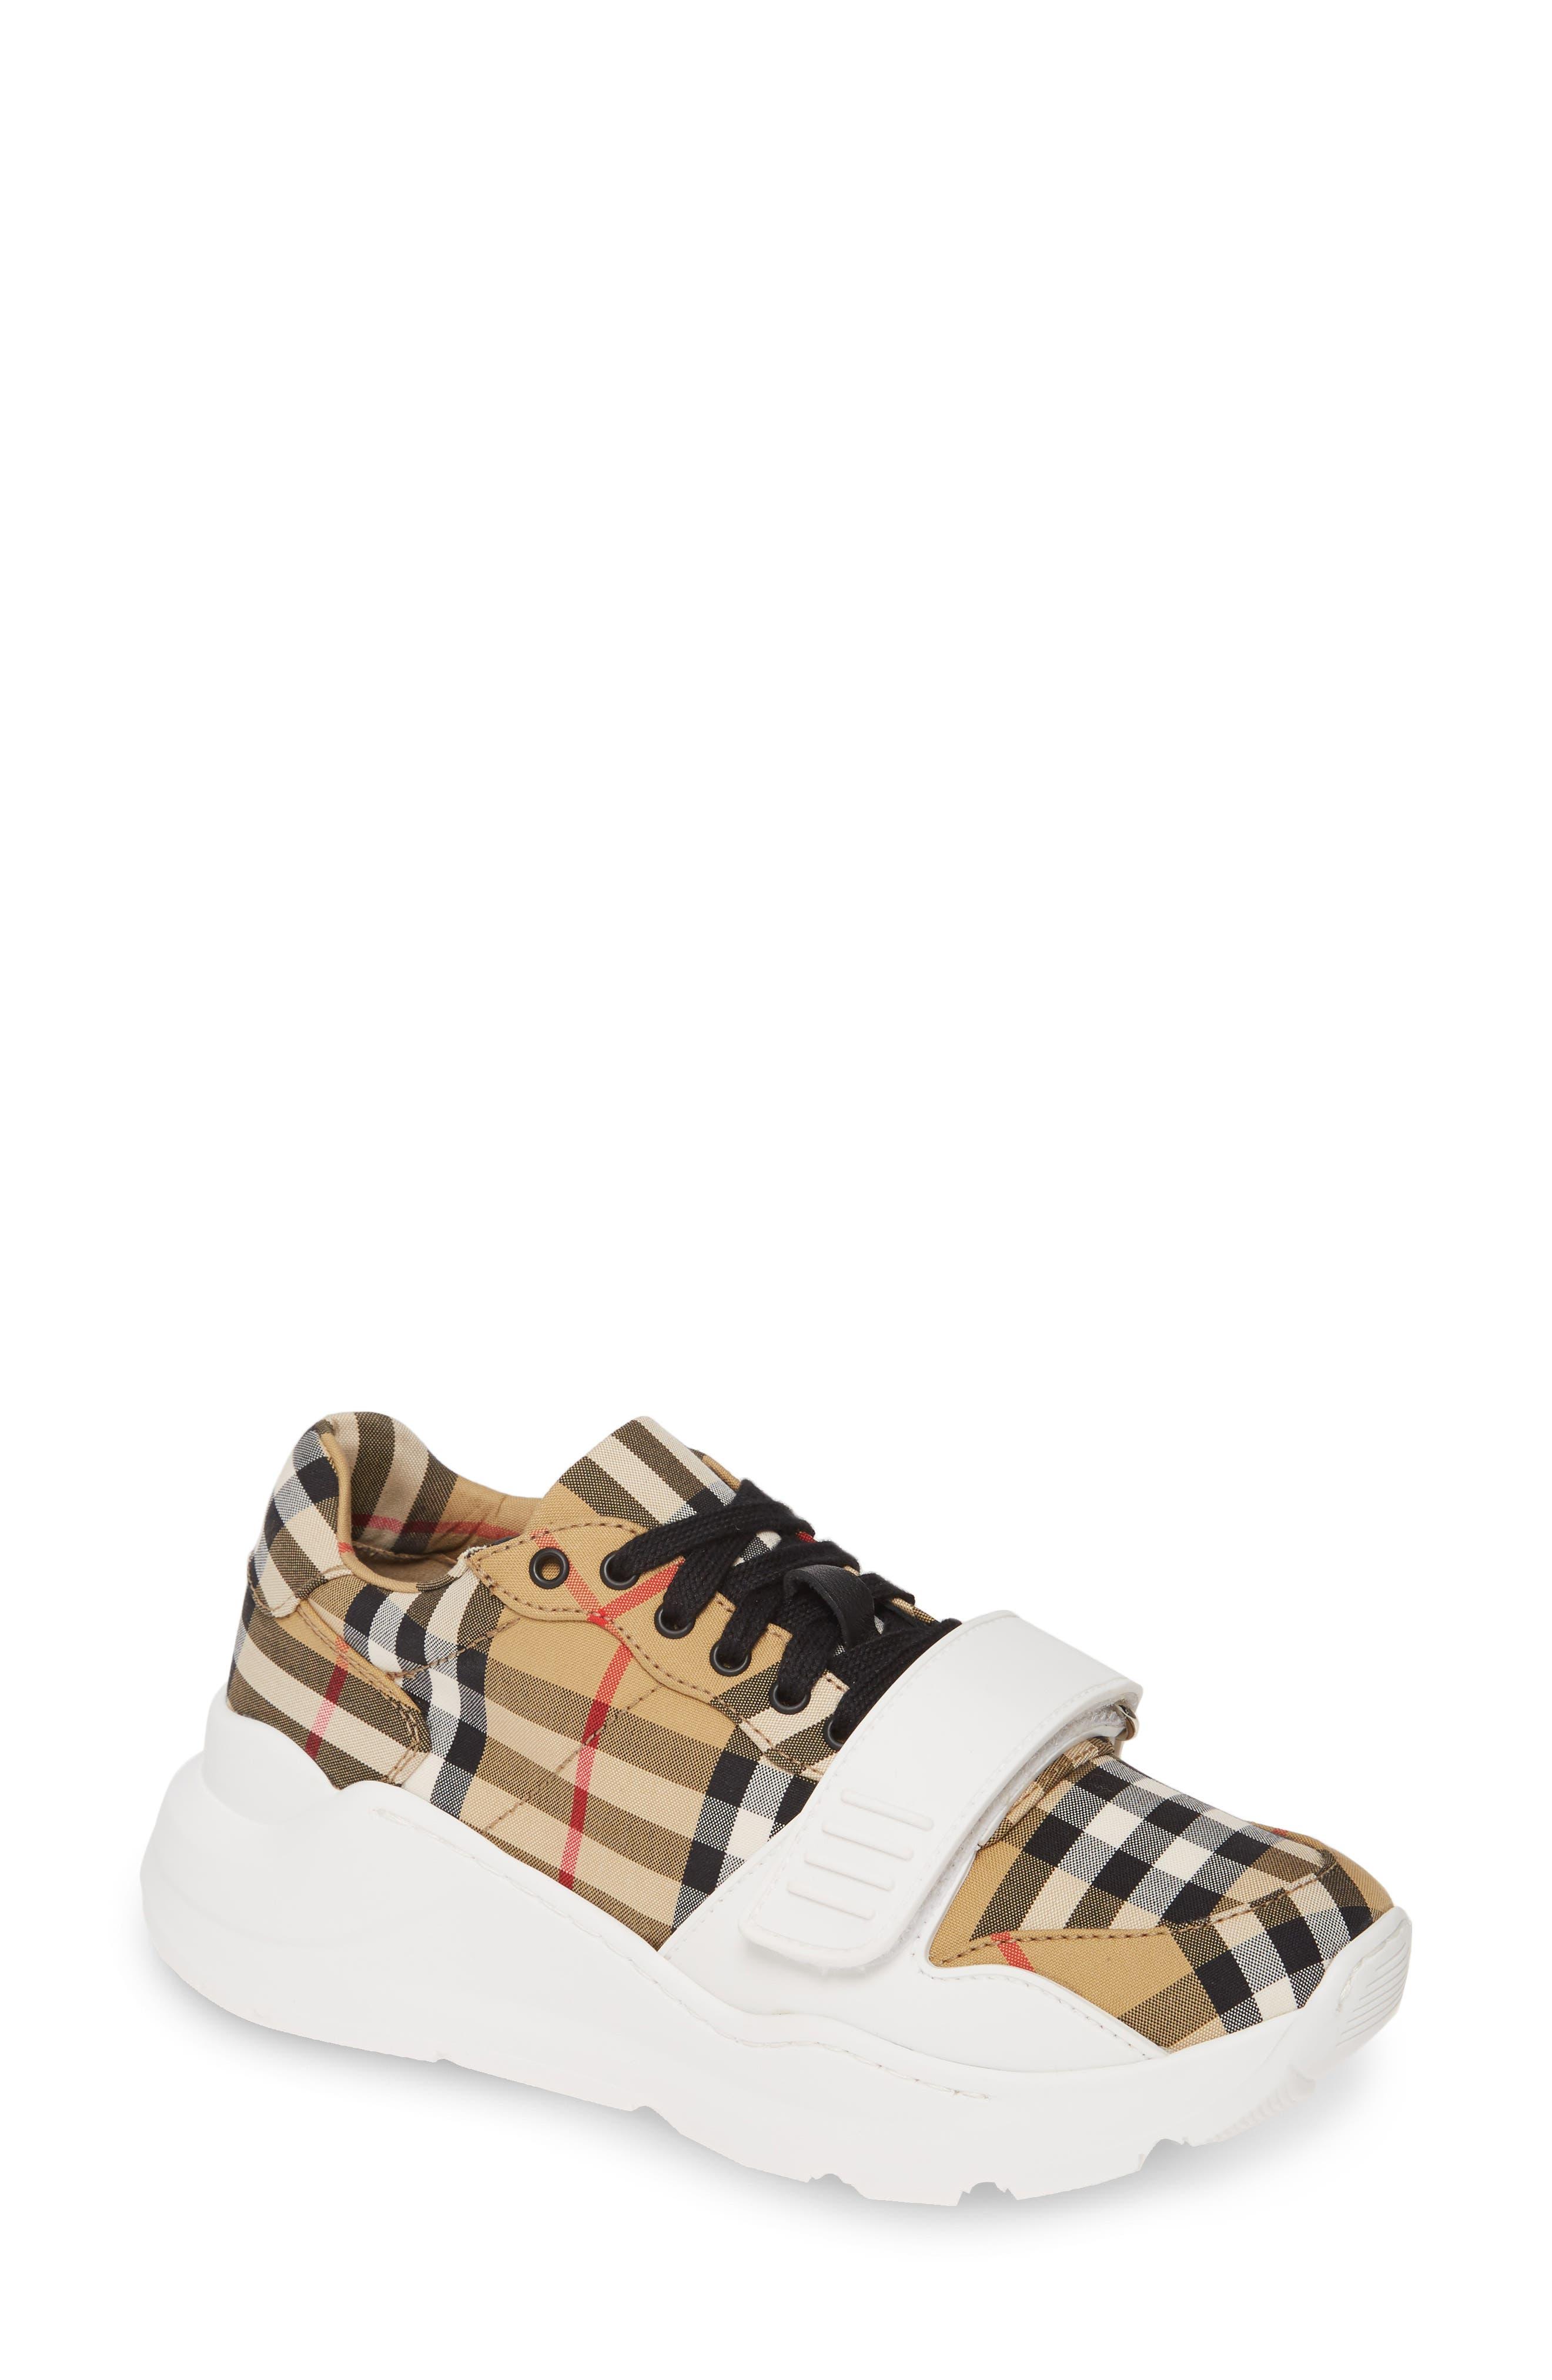 Burberry Regis Check Lace-Up Sneaker - Beige